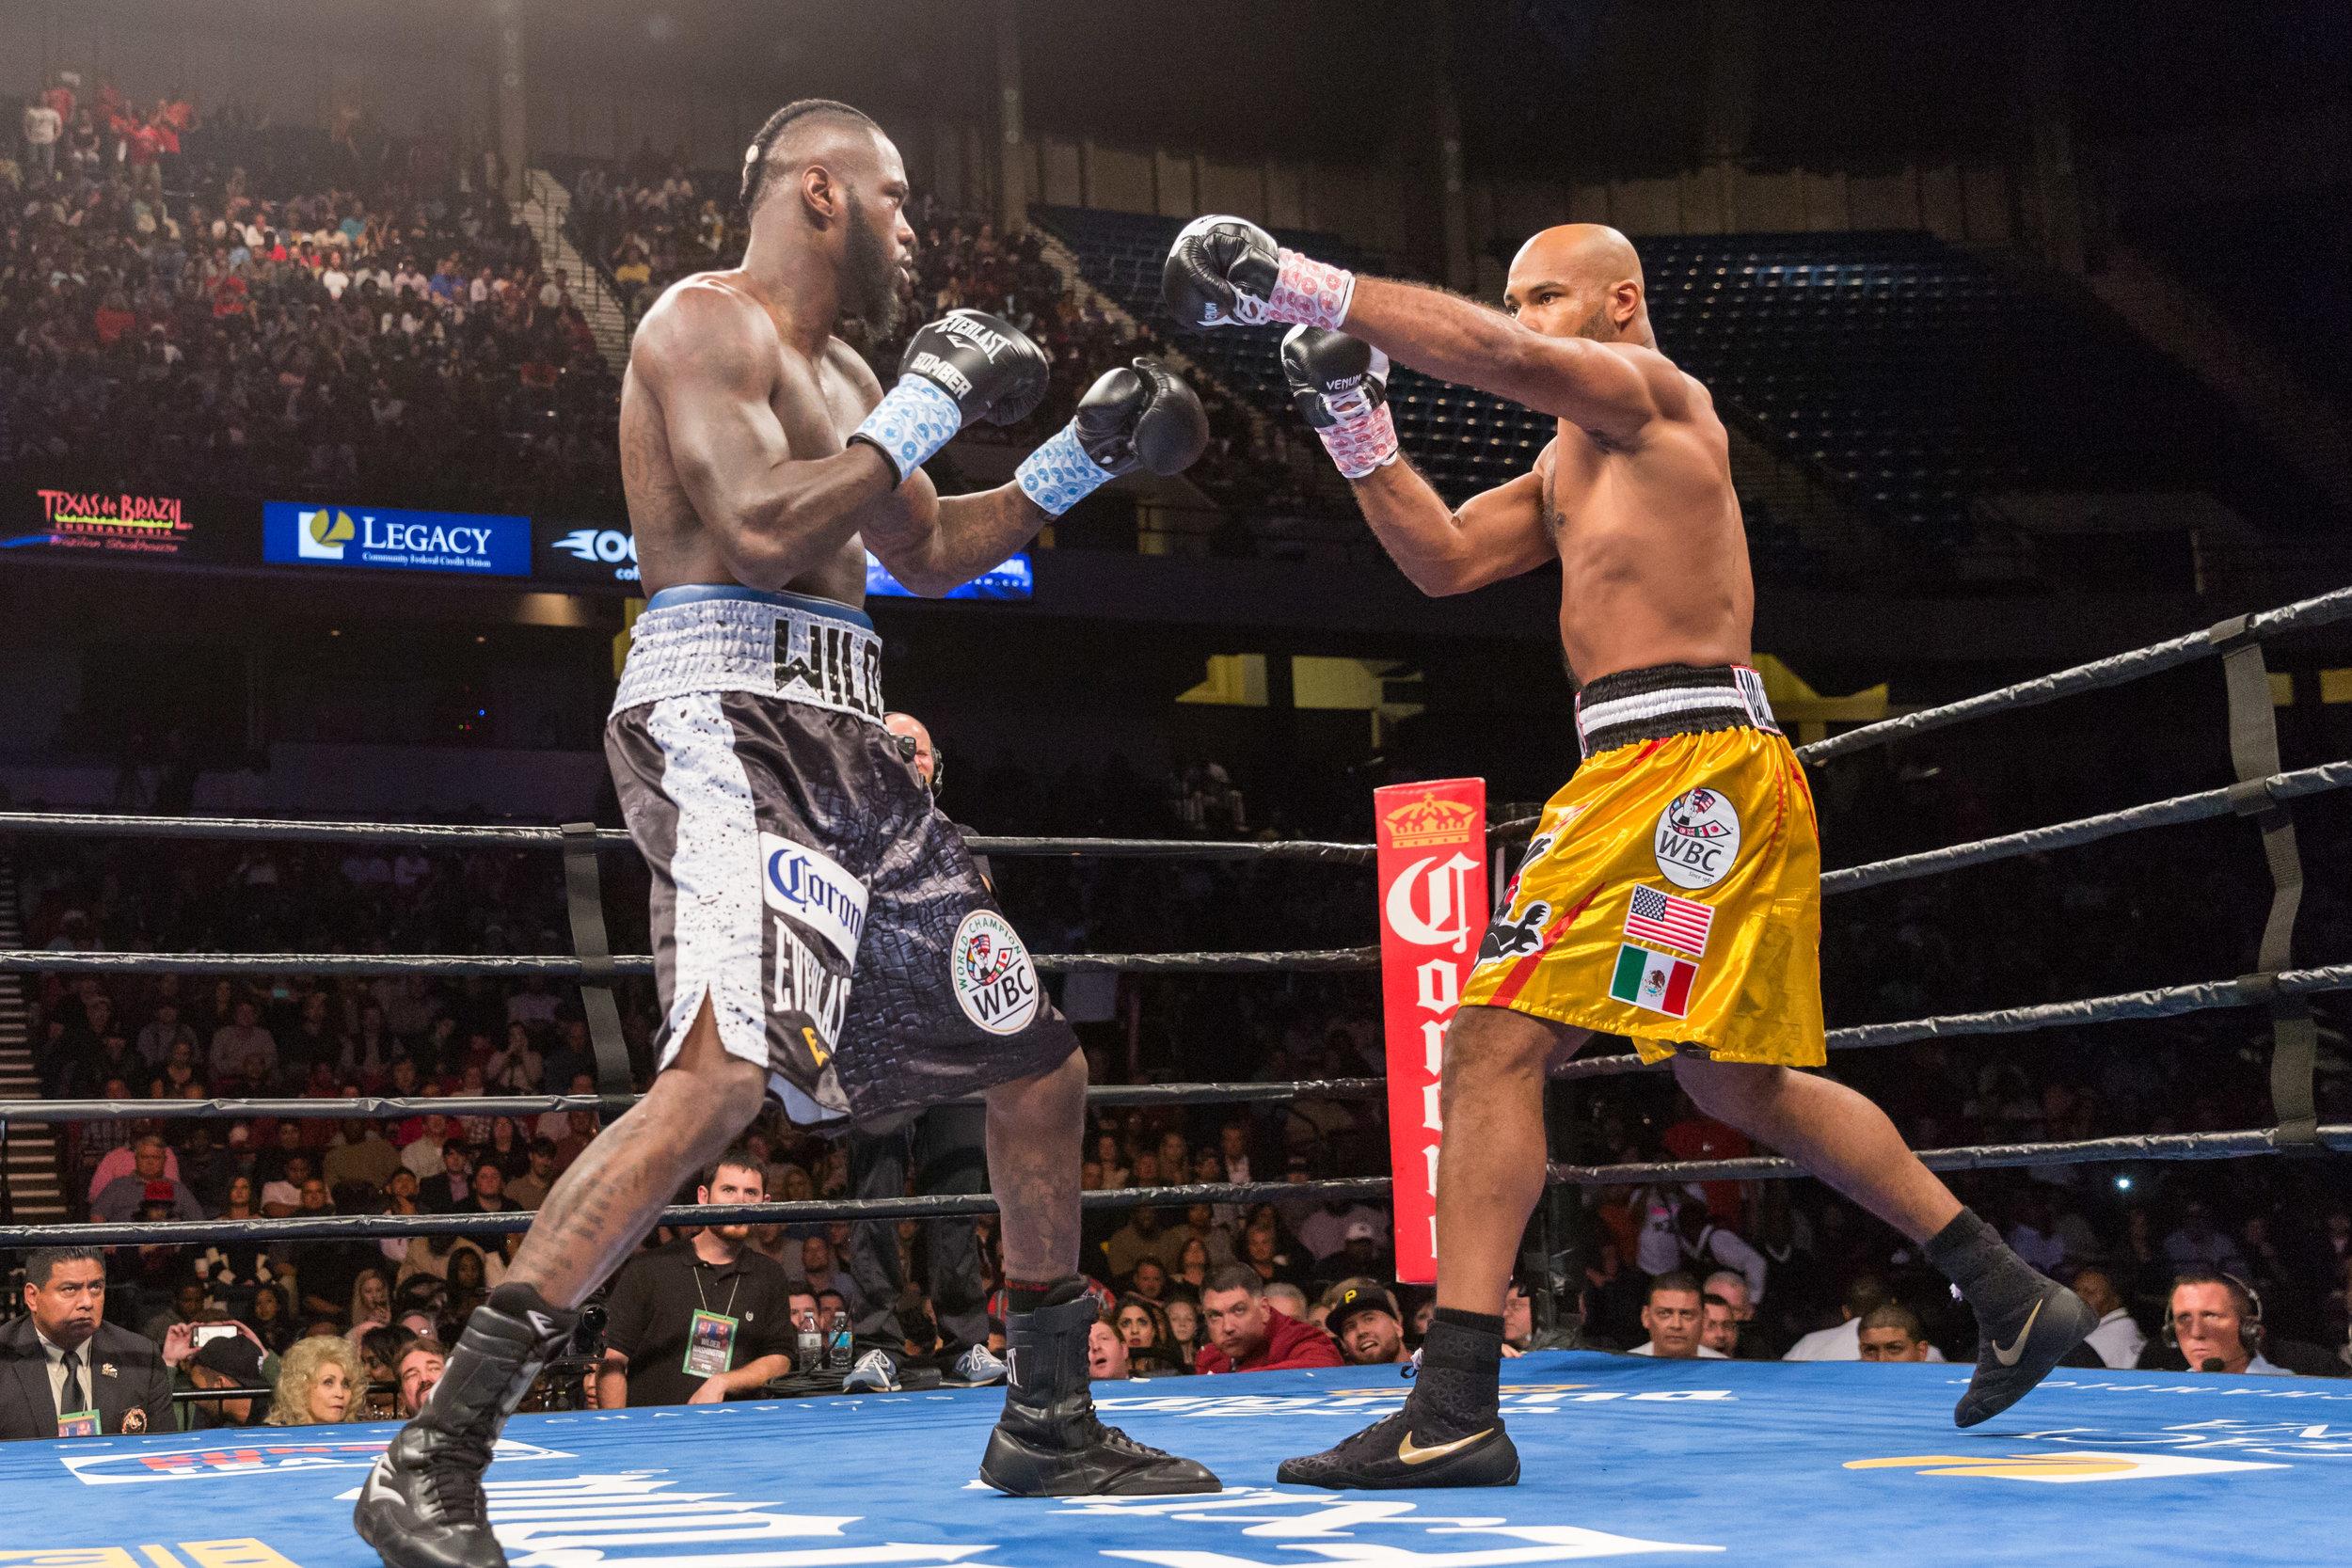 Deontay Wilder vs Gerald Washington - February 25_ 2017_02_25_2017_Fight_Ryan Hafey _ Premier Boxing Champions2.jpg